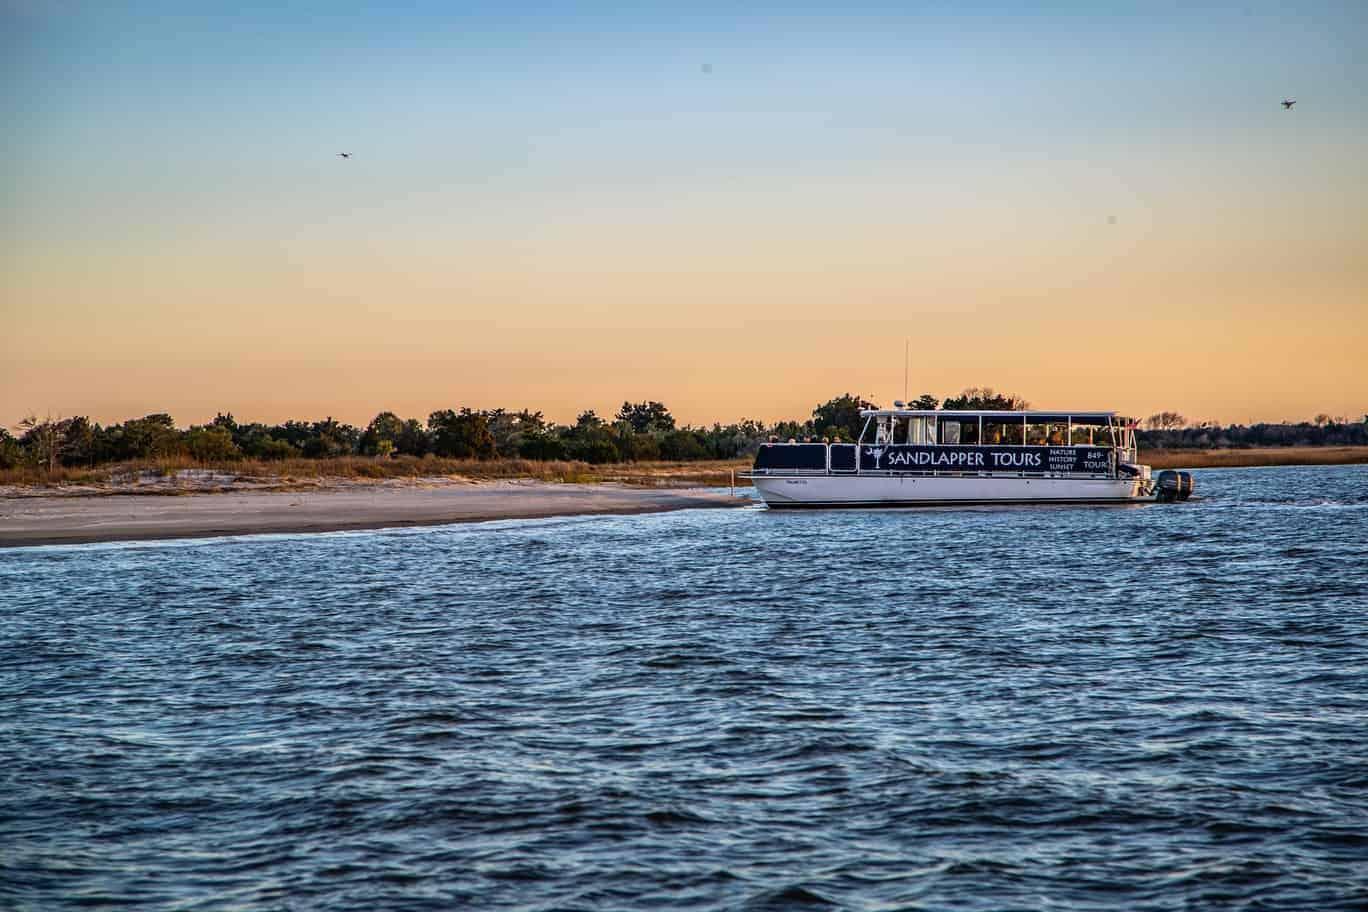 Sandlapper Tour Boat Charleston